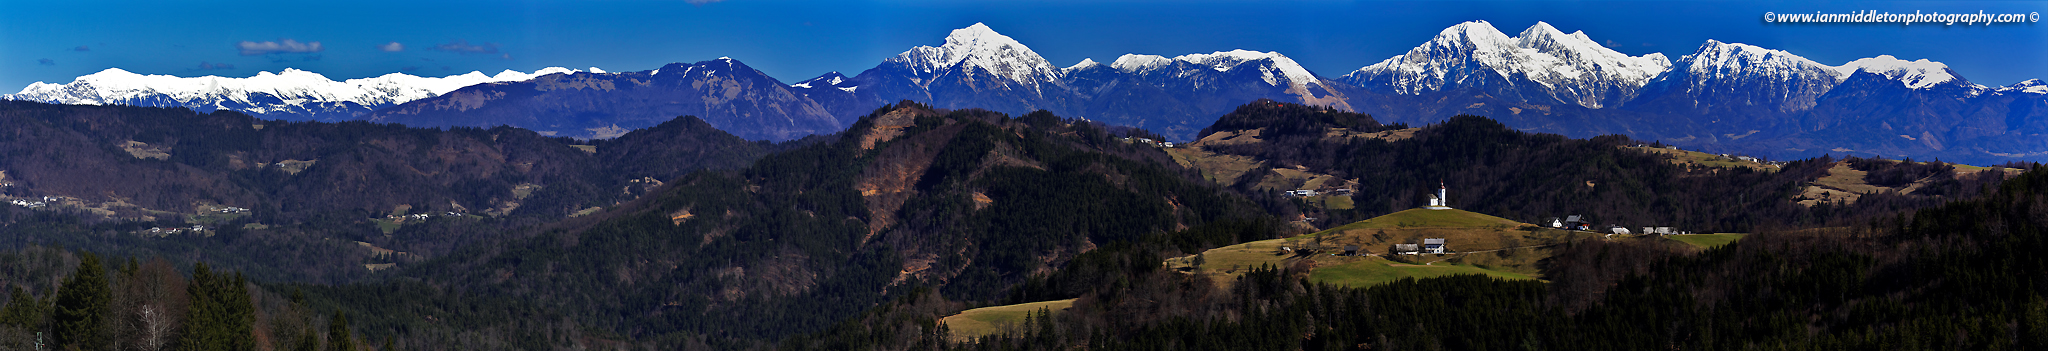 View across to Sveti Tomaz nad Praprotnim (church of Saint Thomas) in the Skofja Loka hills with the snowcapped Kamnik Alps in the background, Slovenia.